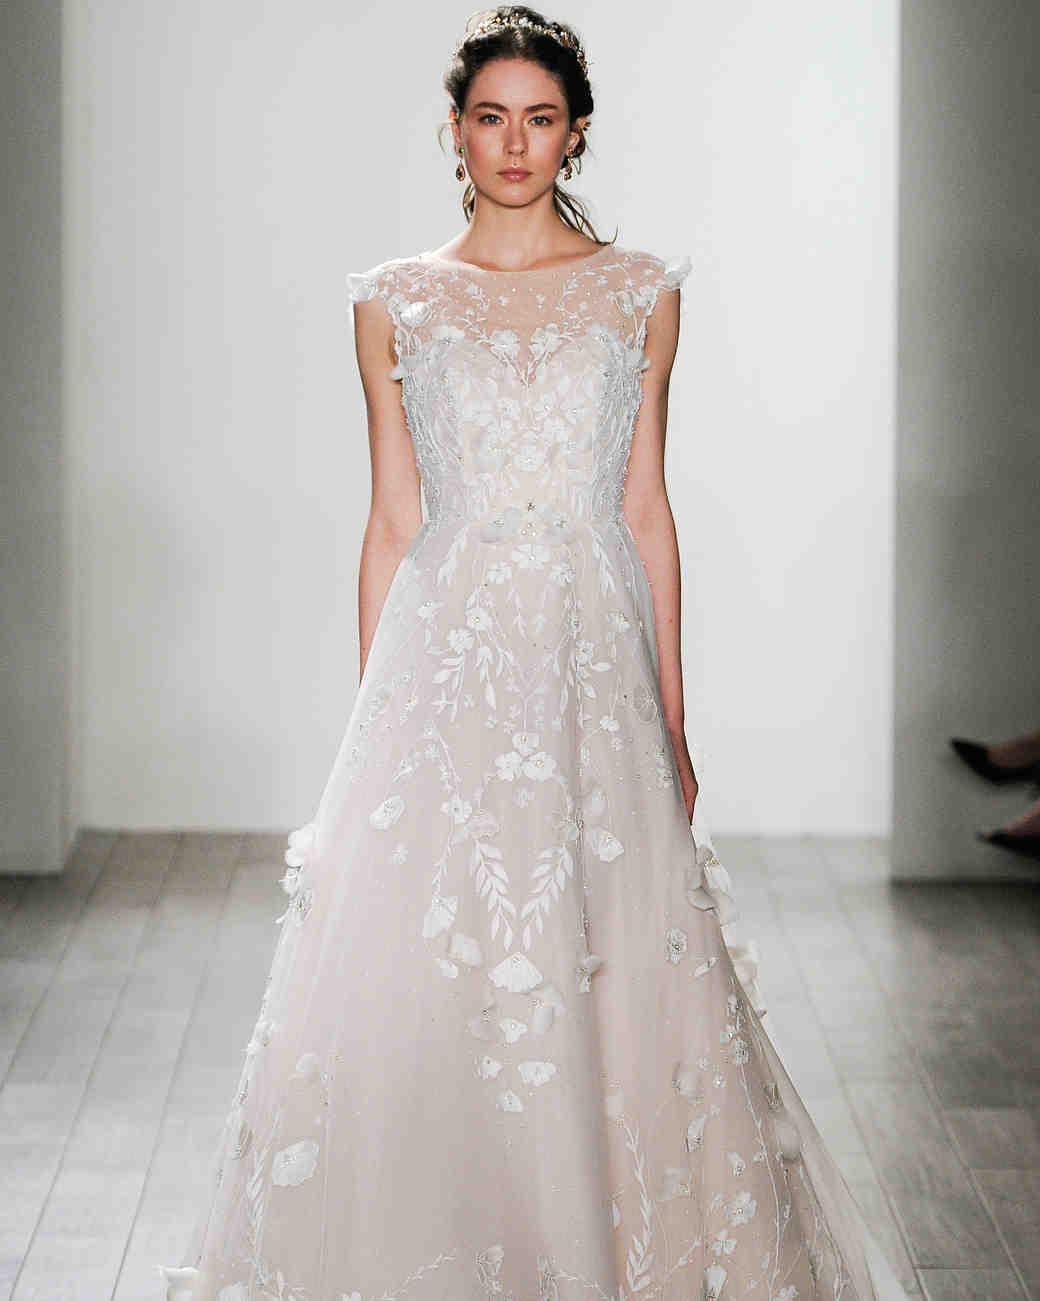 floral wedding gowns beige wedding dresses Alvina Valenta Fall Wedding Dress Collection